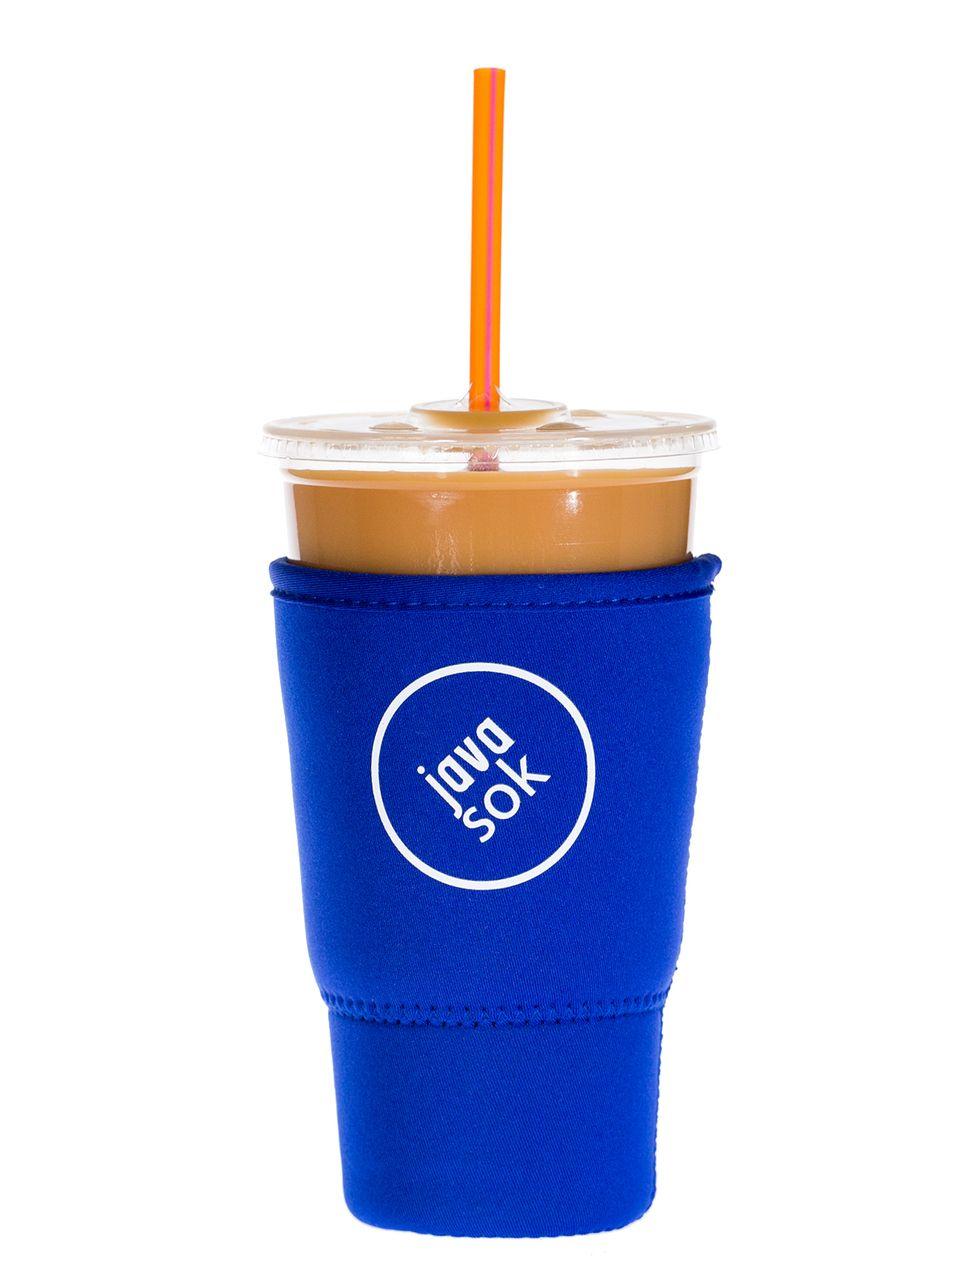 Iced Coffee Sleeve for Dunkin & Starbucks Cups | Java Sok Large Blue